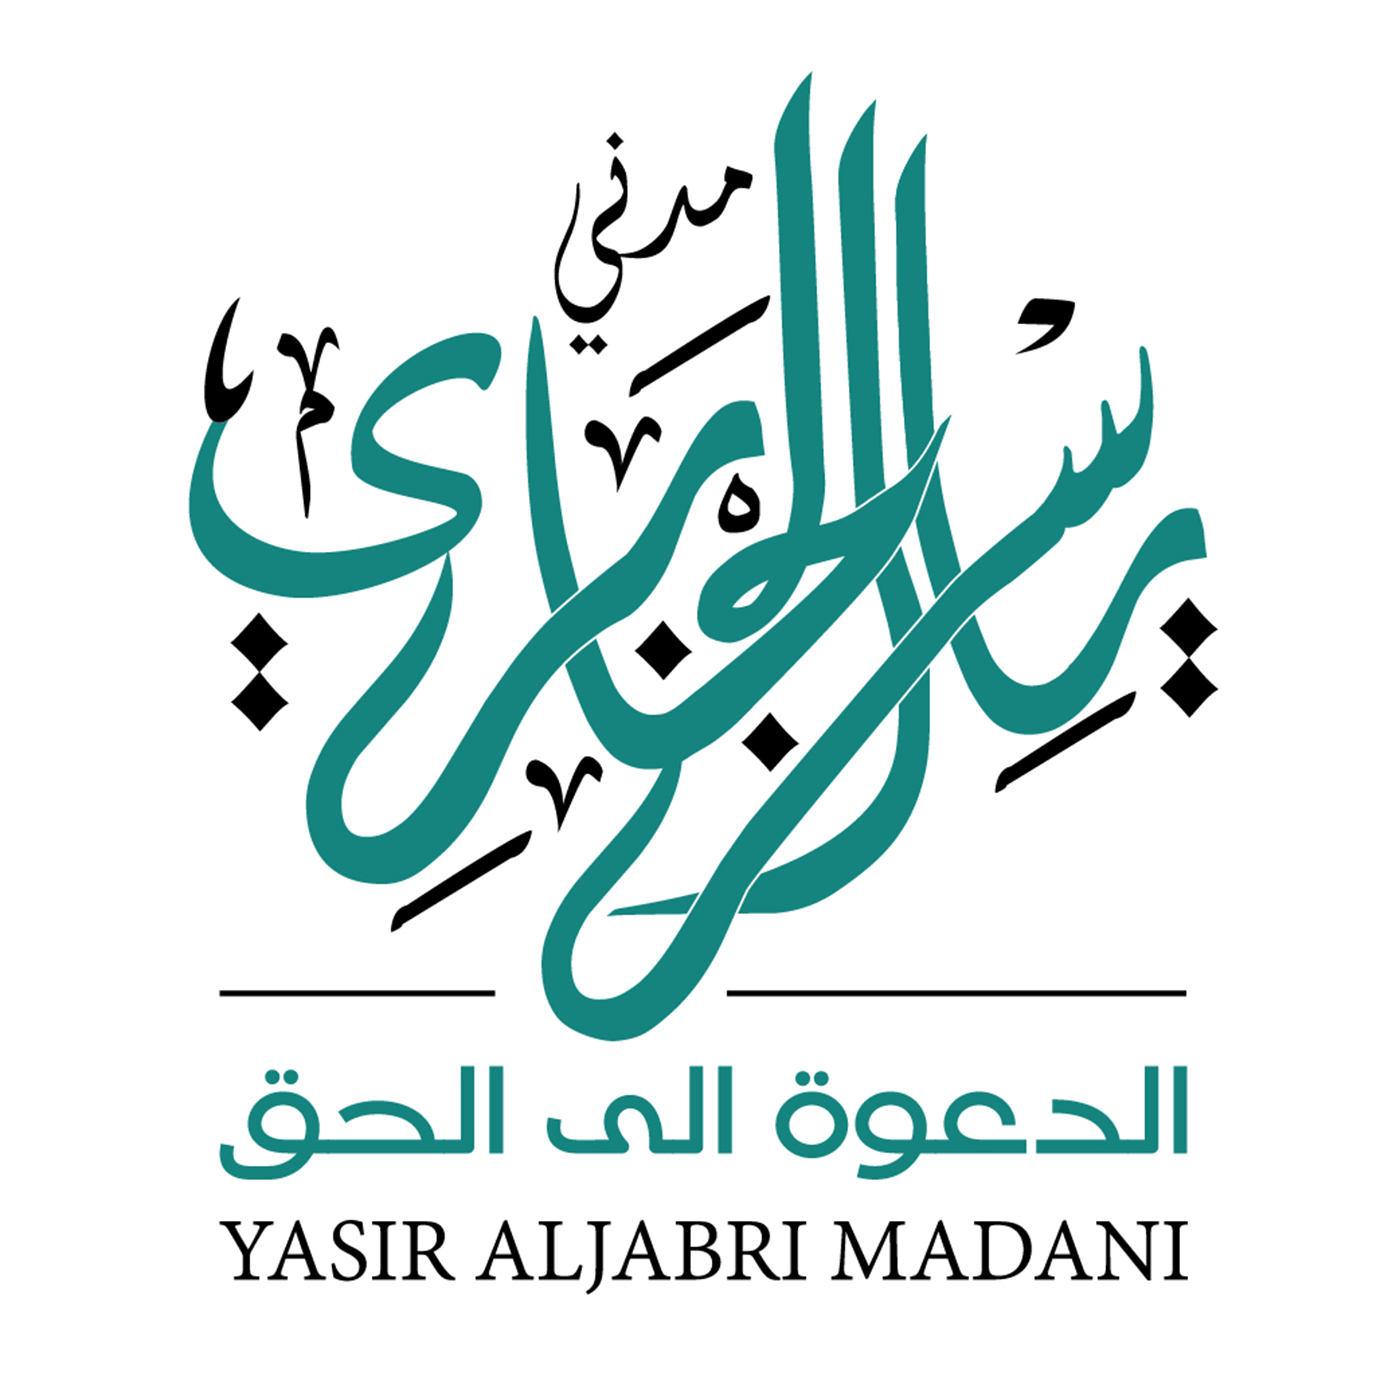 Podfanatic Podcast Shaikh Yasir Aljabri Madani Blog